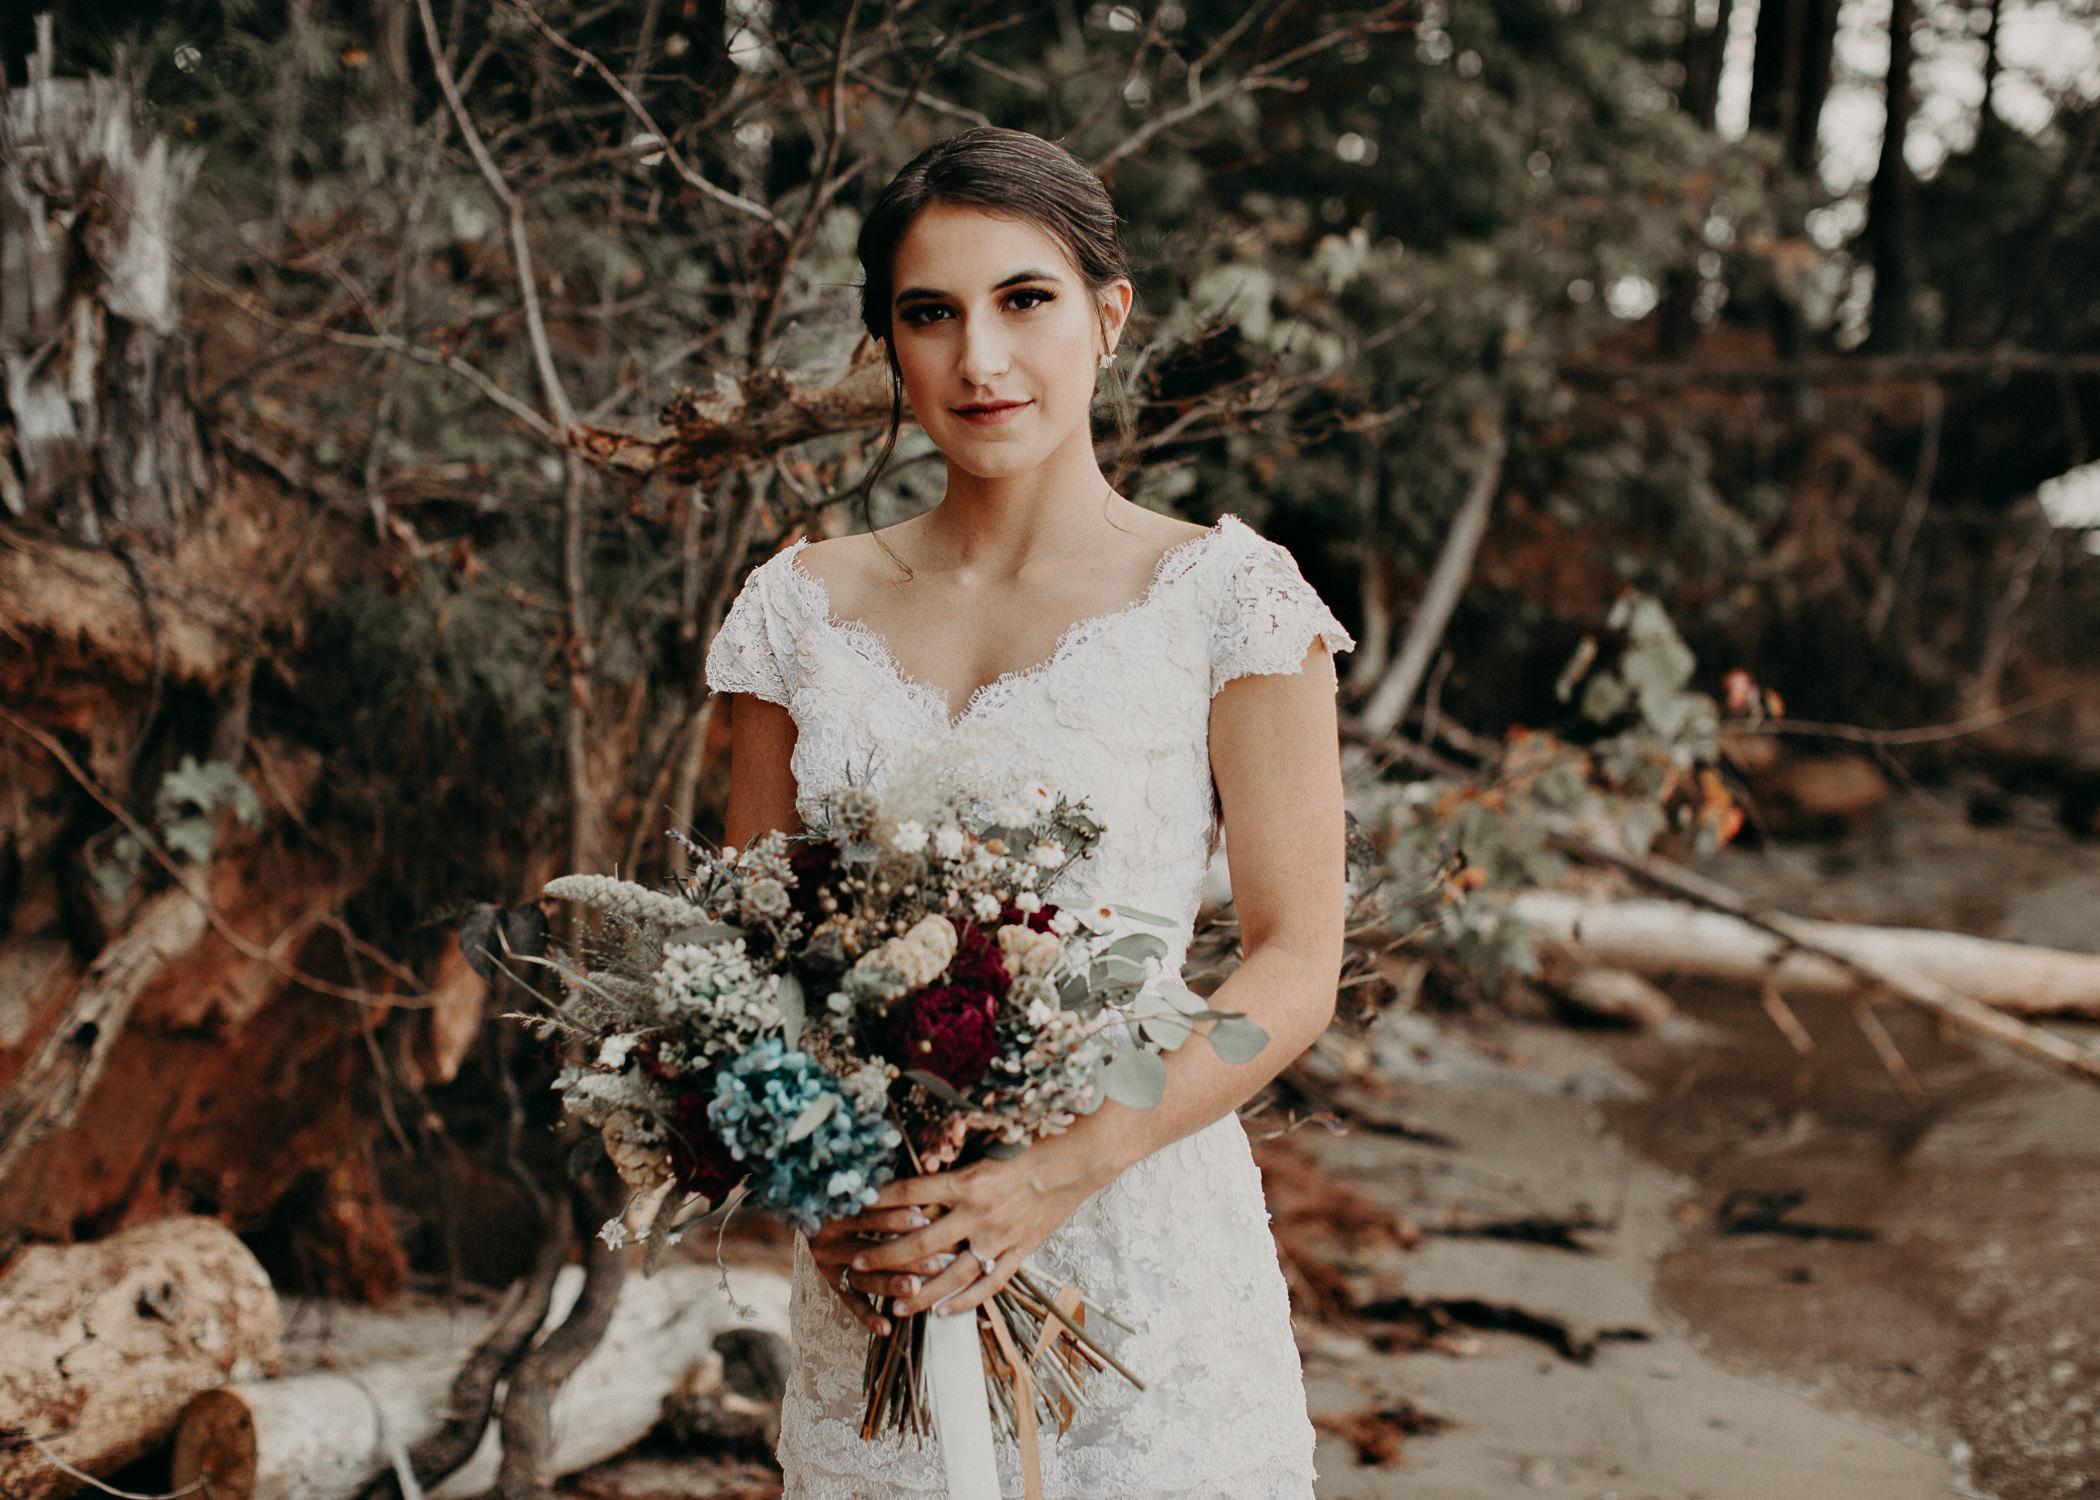 60  Bride & Groom Portraits before the ceremony on wedding day - Atlanta Wedding Photographer .jpg